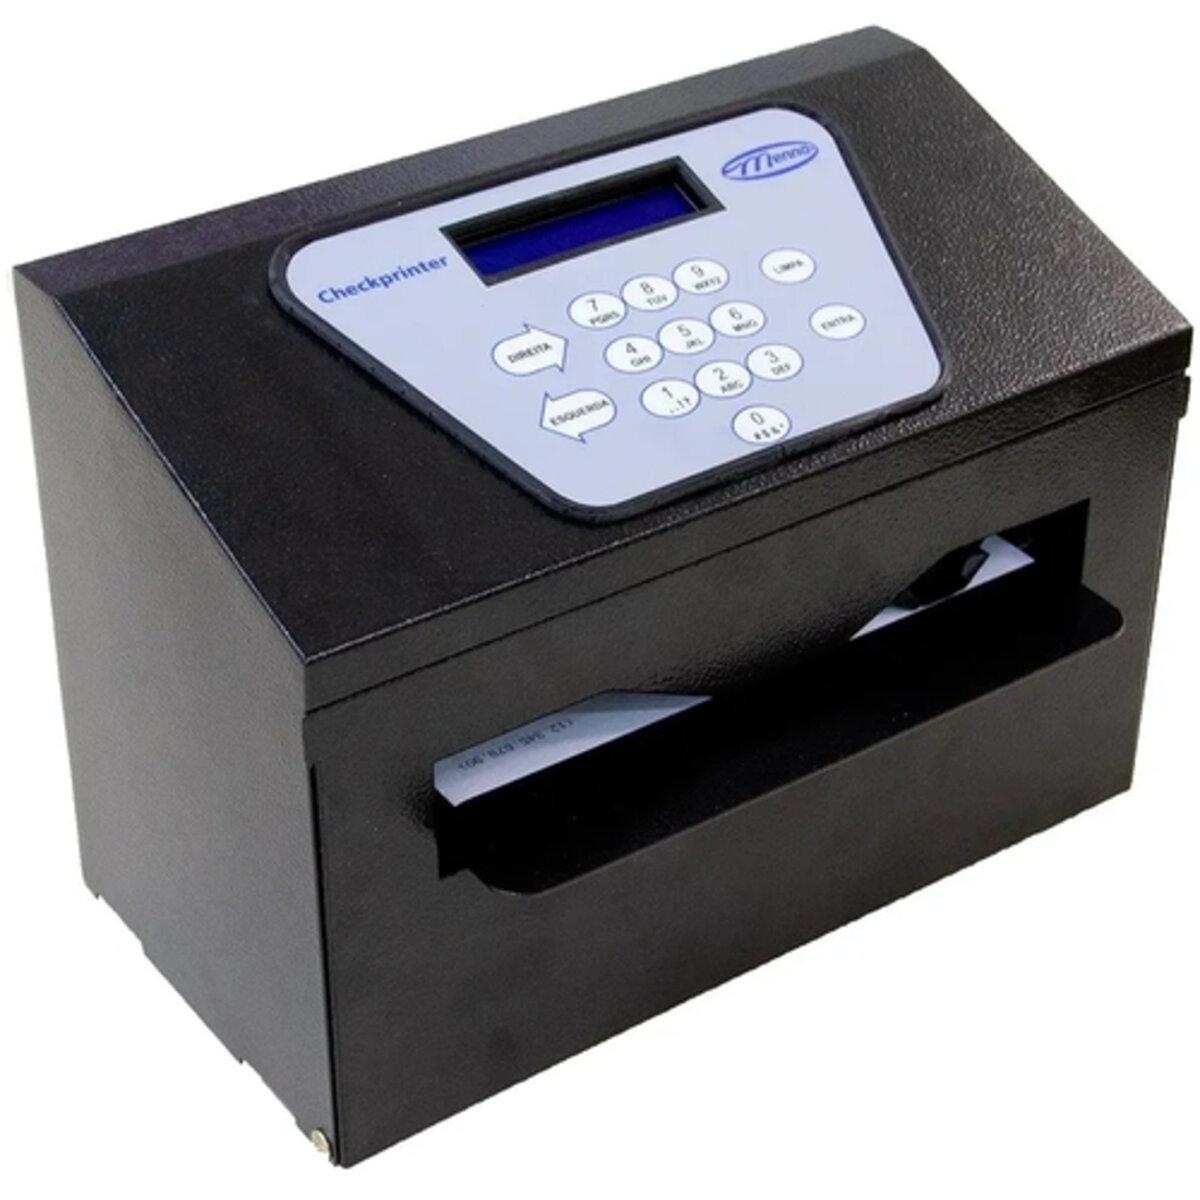 Impressora de cheque Datacheck Chekprinter II Menno